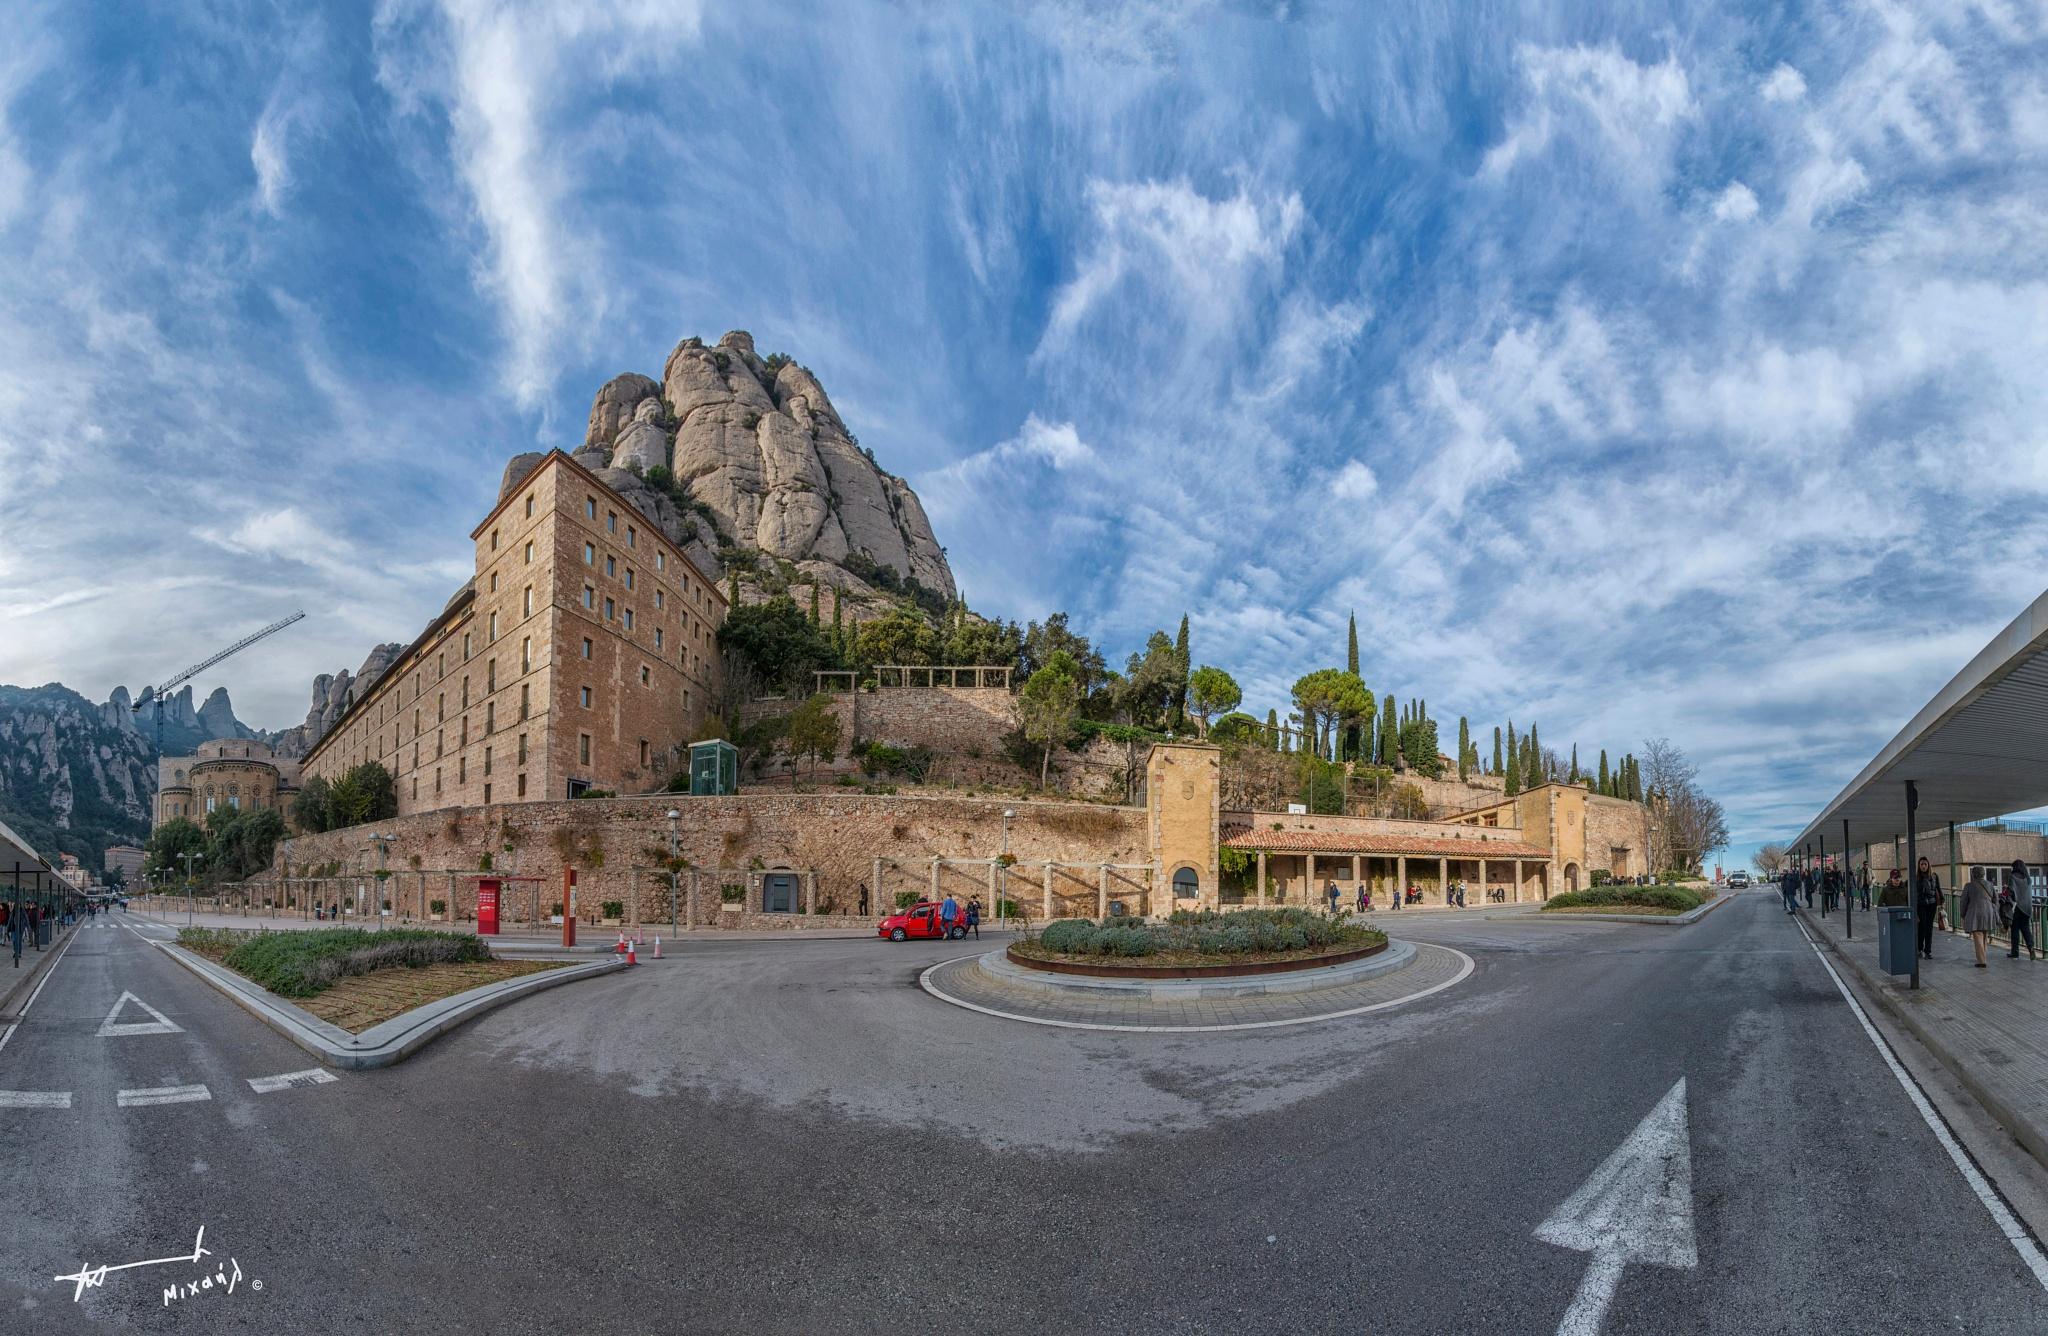 Santa Maria de Montserrat Abbey by Michail